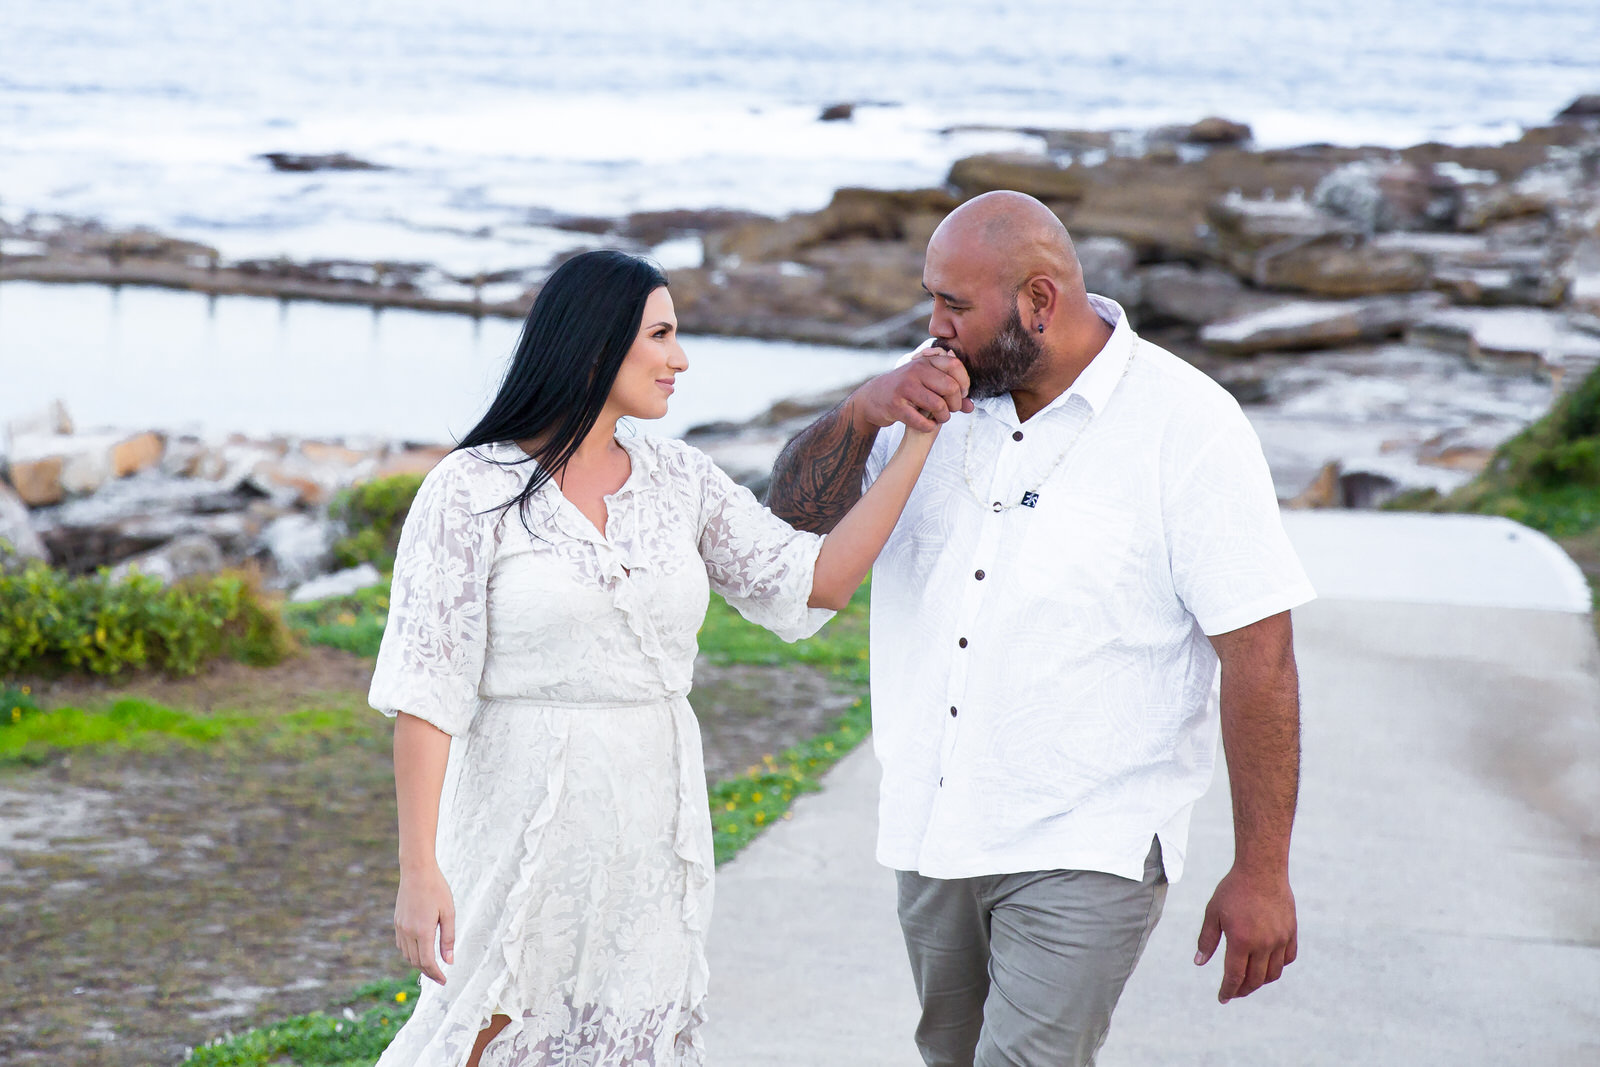 Sydney Wedding Photographer - Maroubra Beach - Jennifer Lam Photography (21).jpg